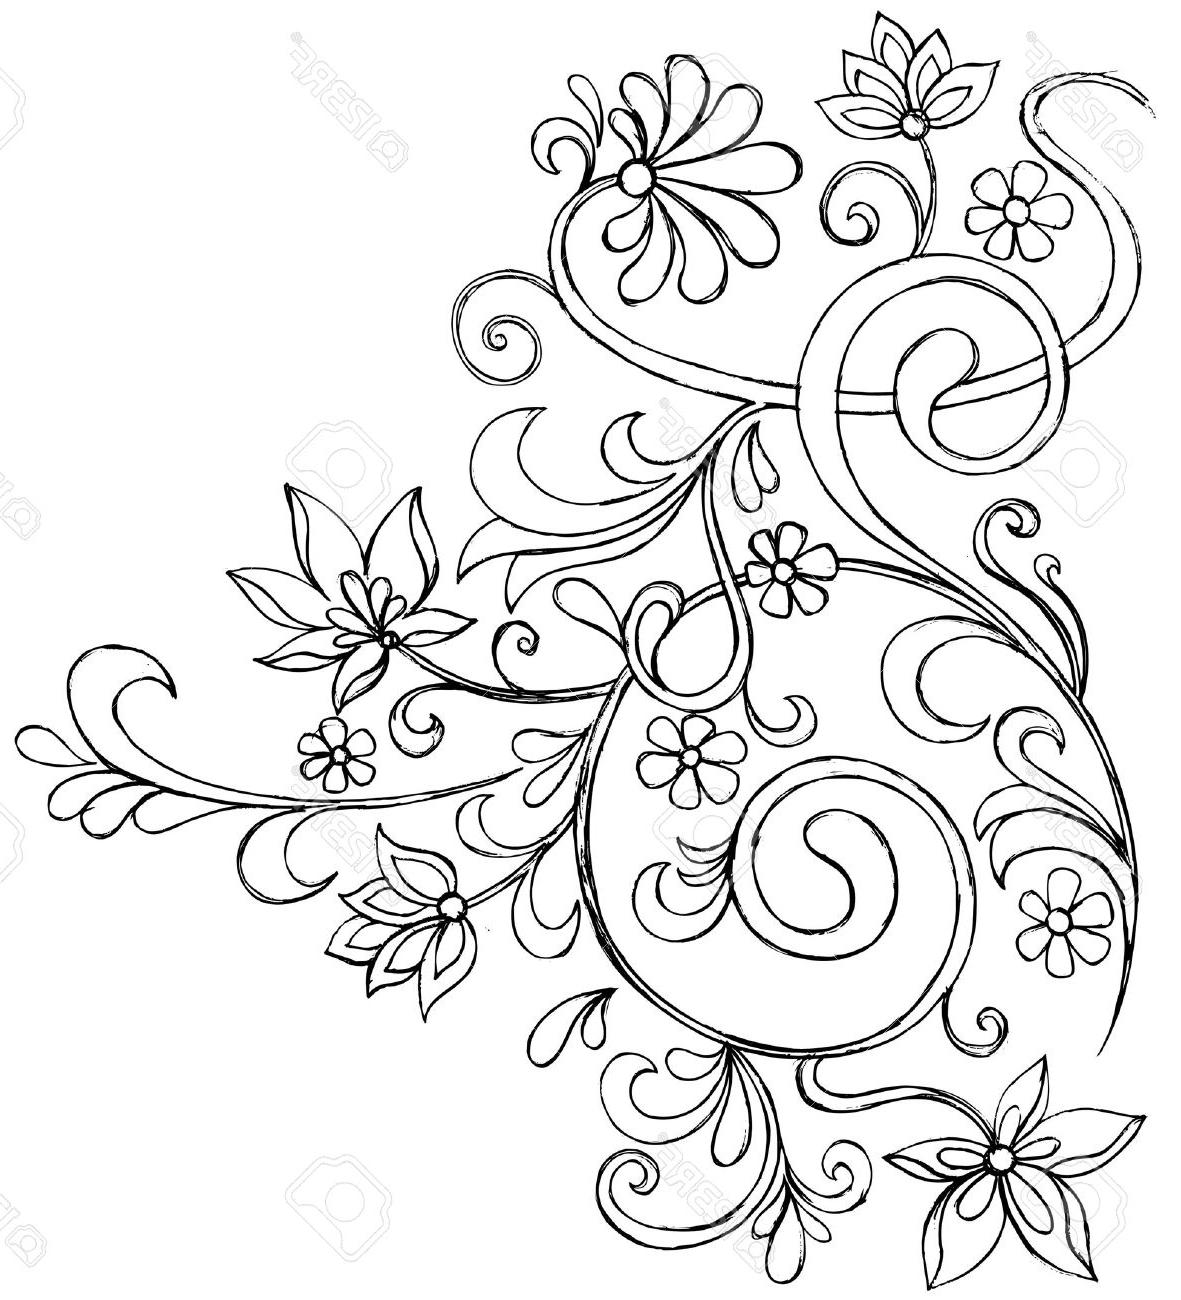 1181x1300 Easy Drawings Of Flowers And Vines Best Vine Drawing Ideas